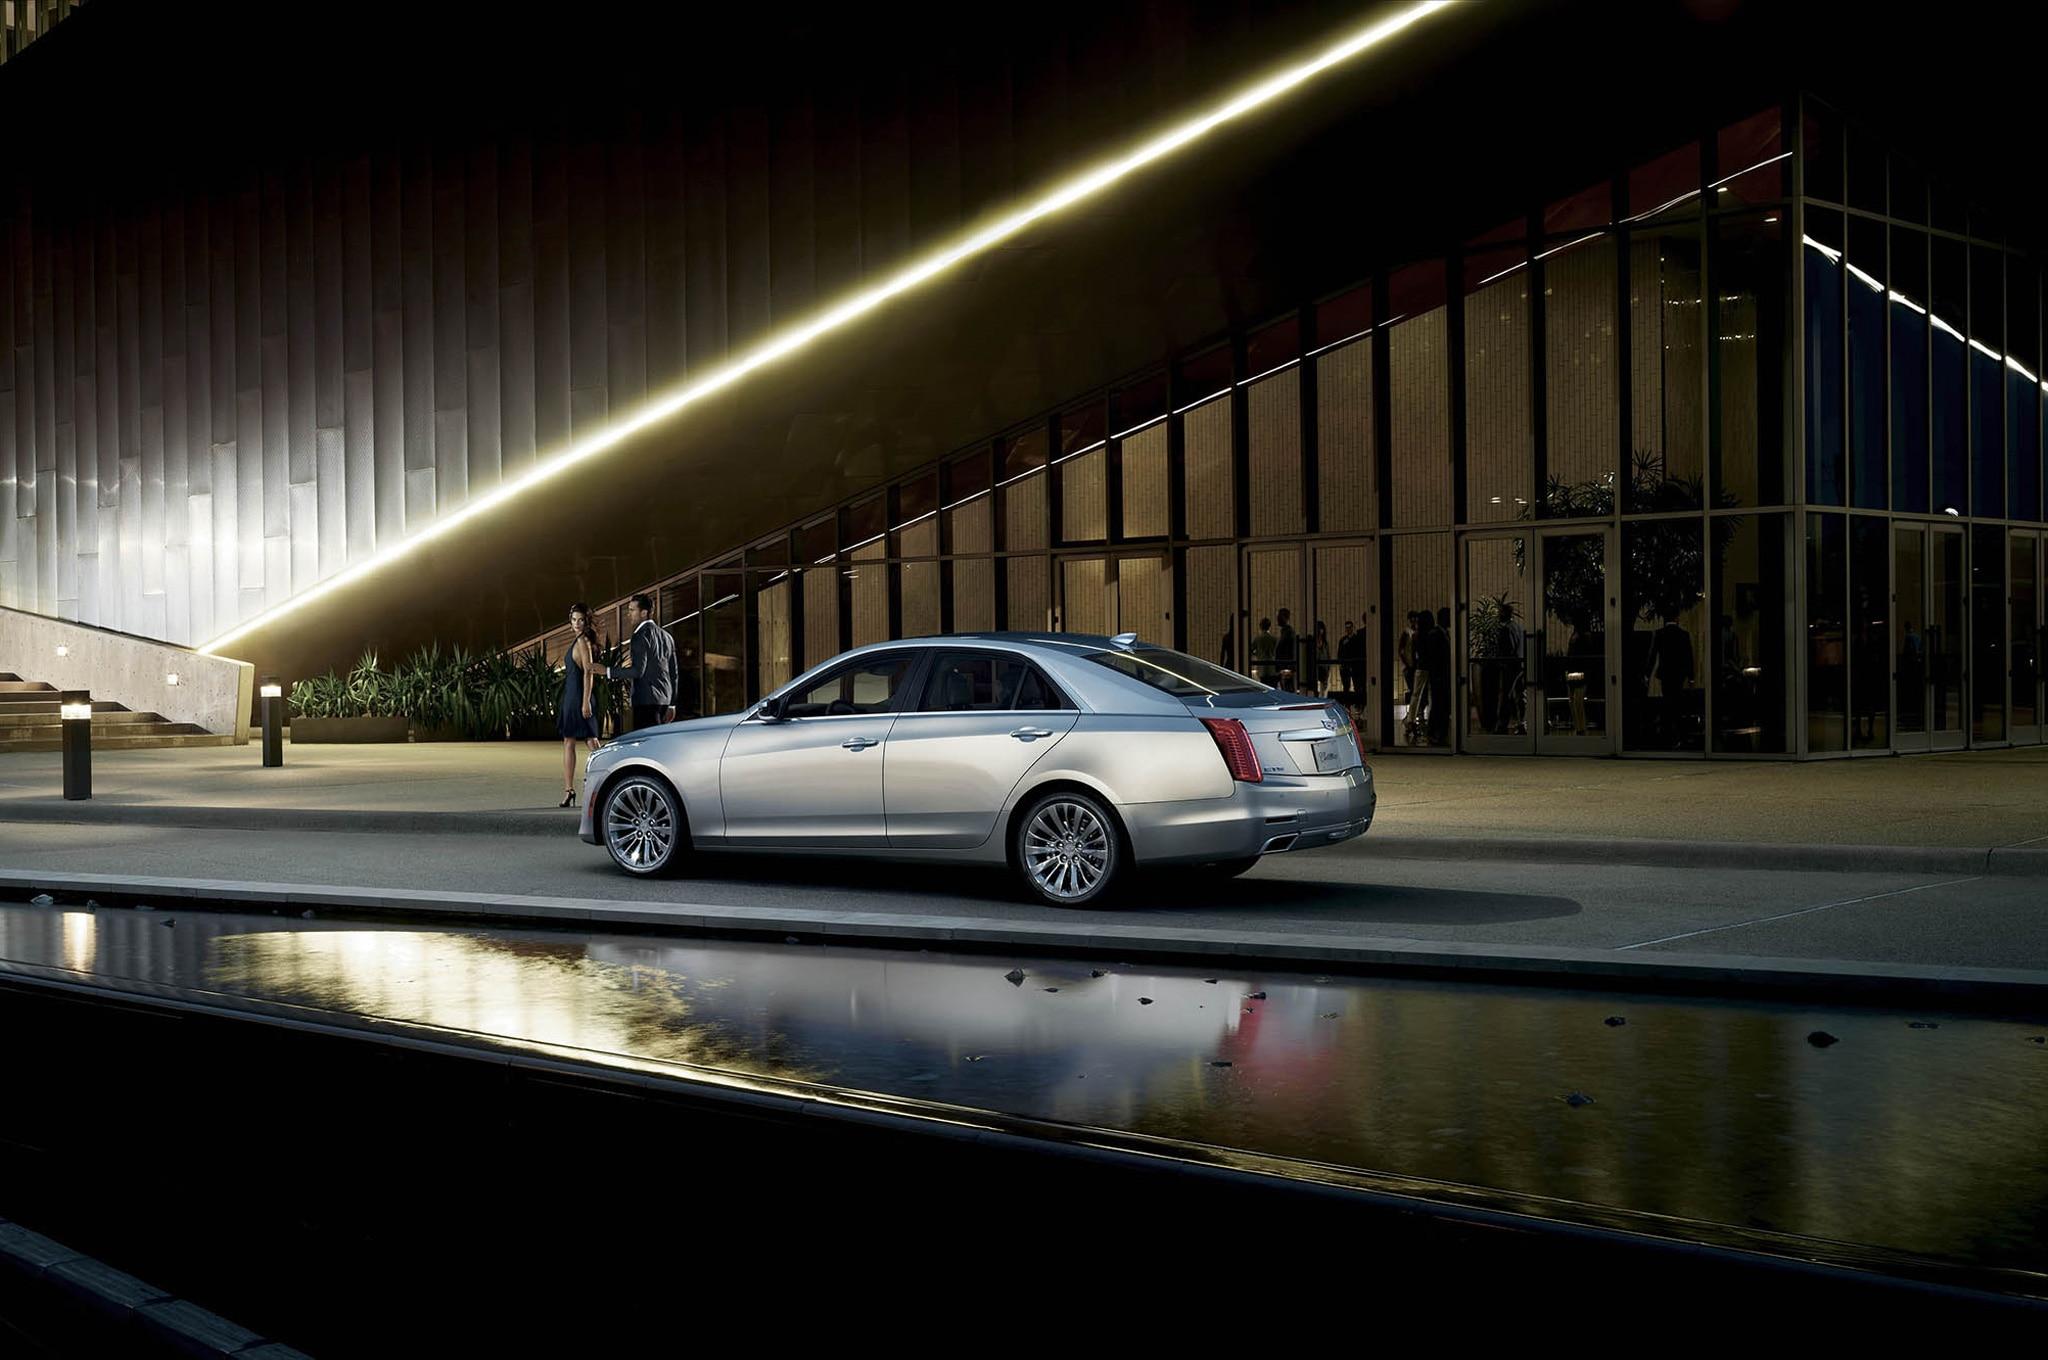 2015 Cadillac CTS Rear Three Quarter In Motion1